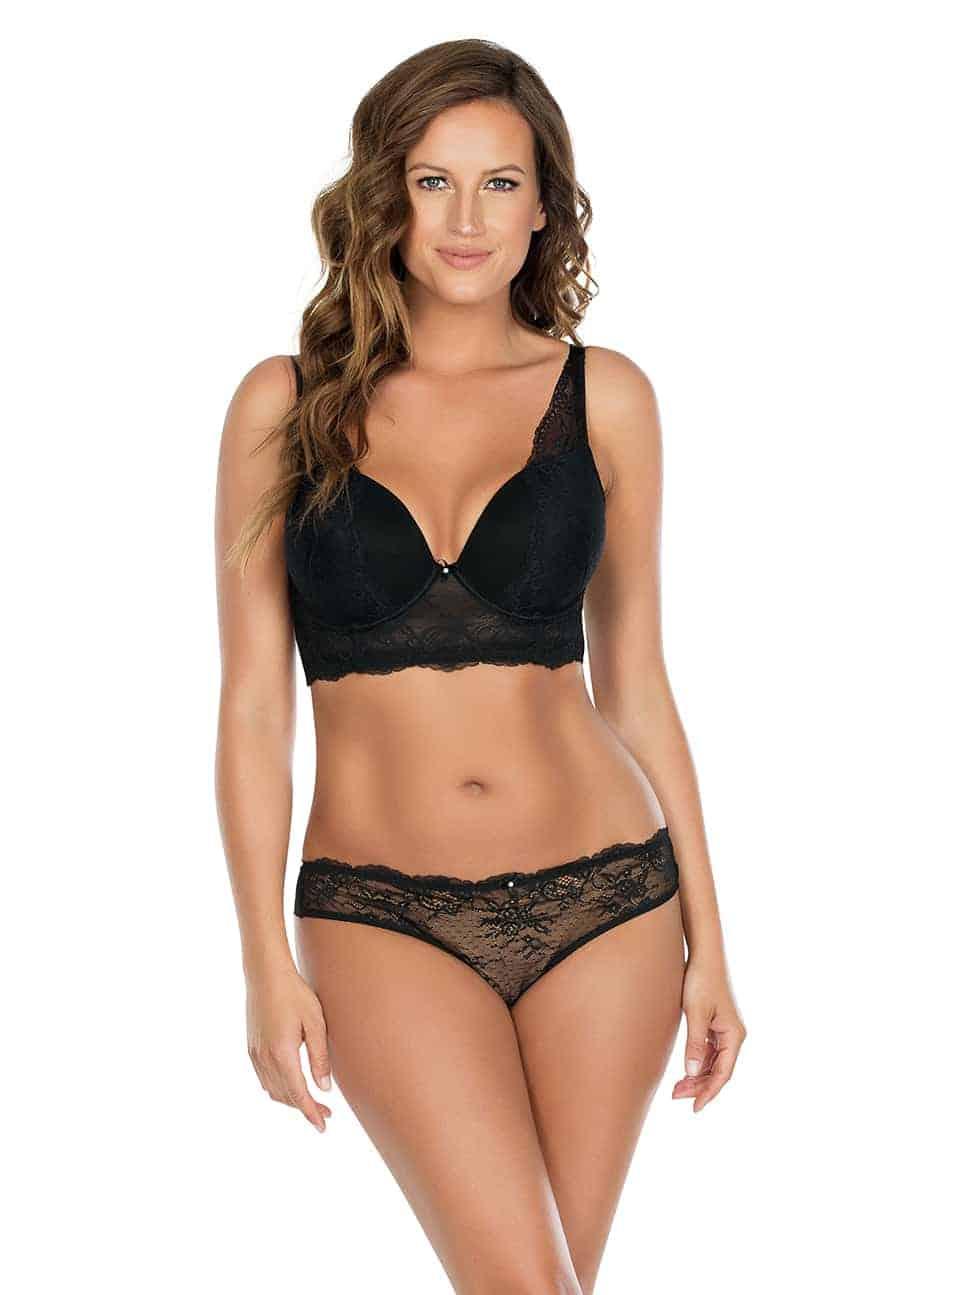 Sandrine PlungeLonglineBraP5351 BrazilianThongP5354 Black Front - Sandrine Longline Bra Black P5351